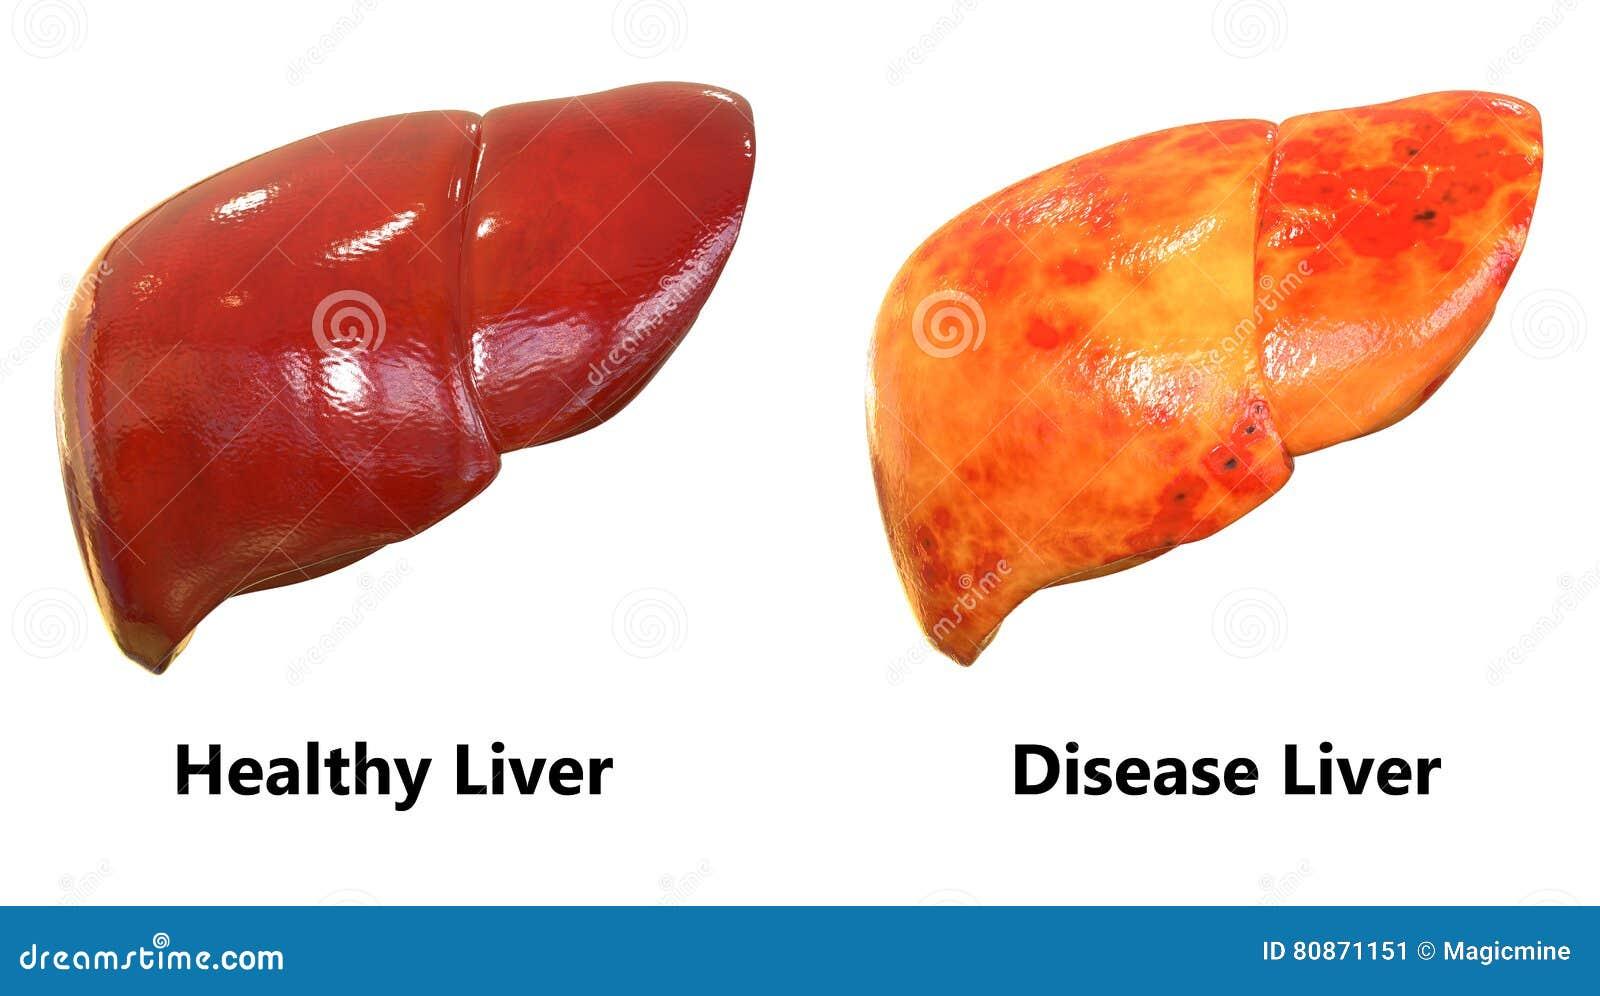 Human Body Organs Liver Anatomy Stock Illustration Illustration Of